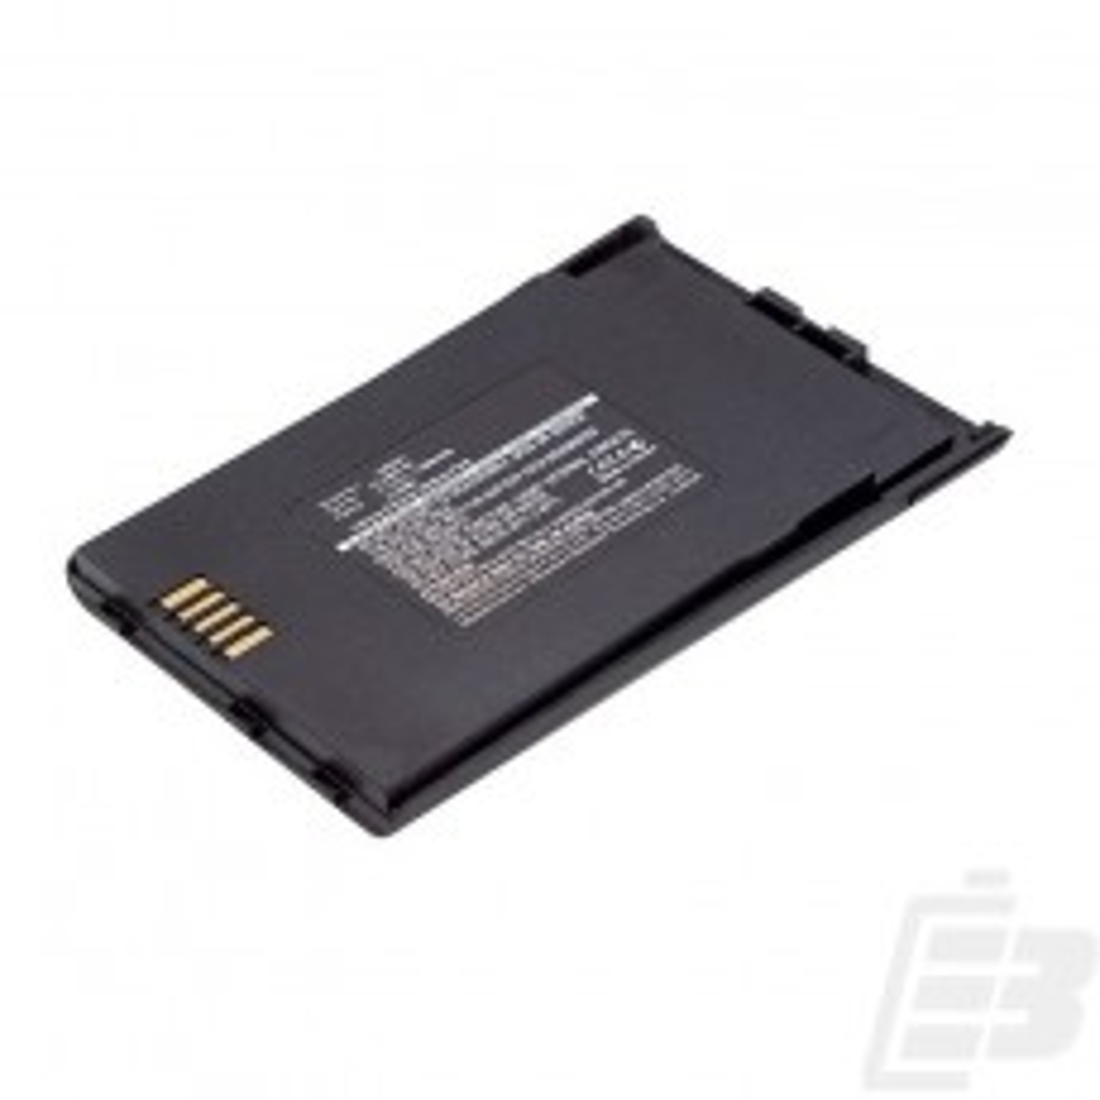 Cordless phone battery Cisco CP-7921_1